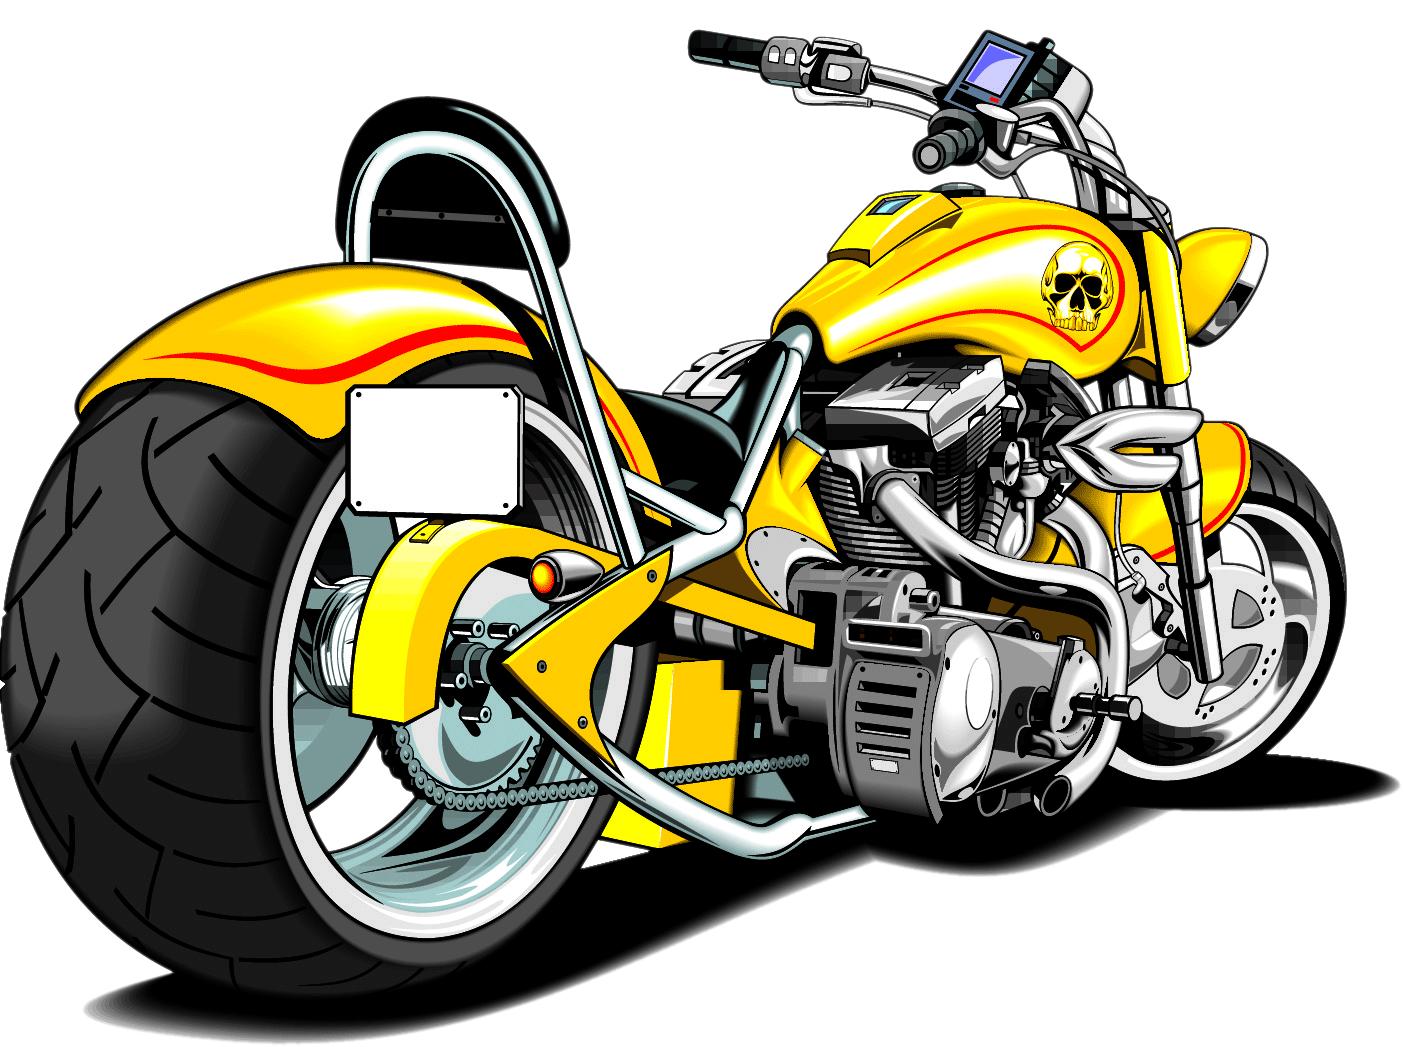 Harley Davidson PNG - 11038